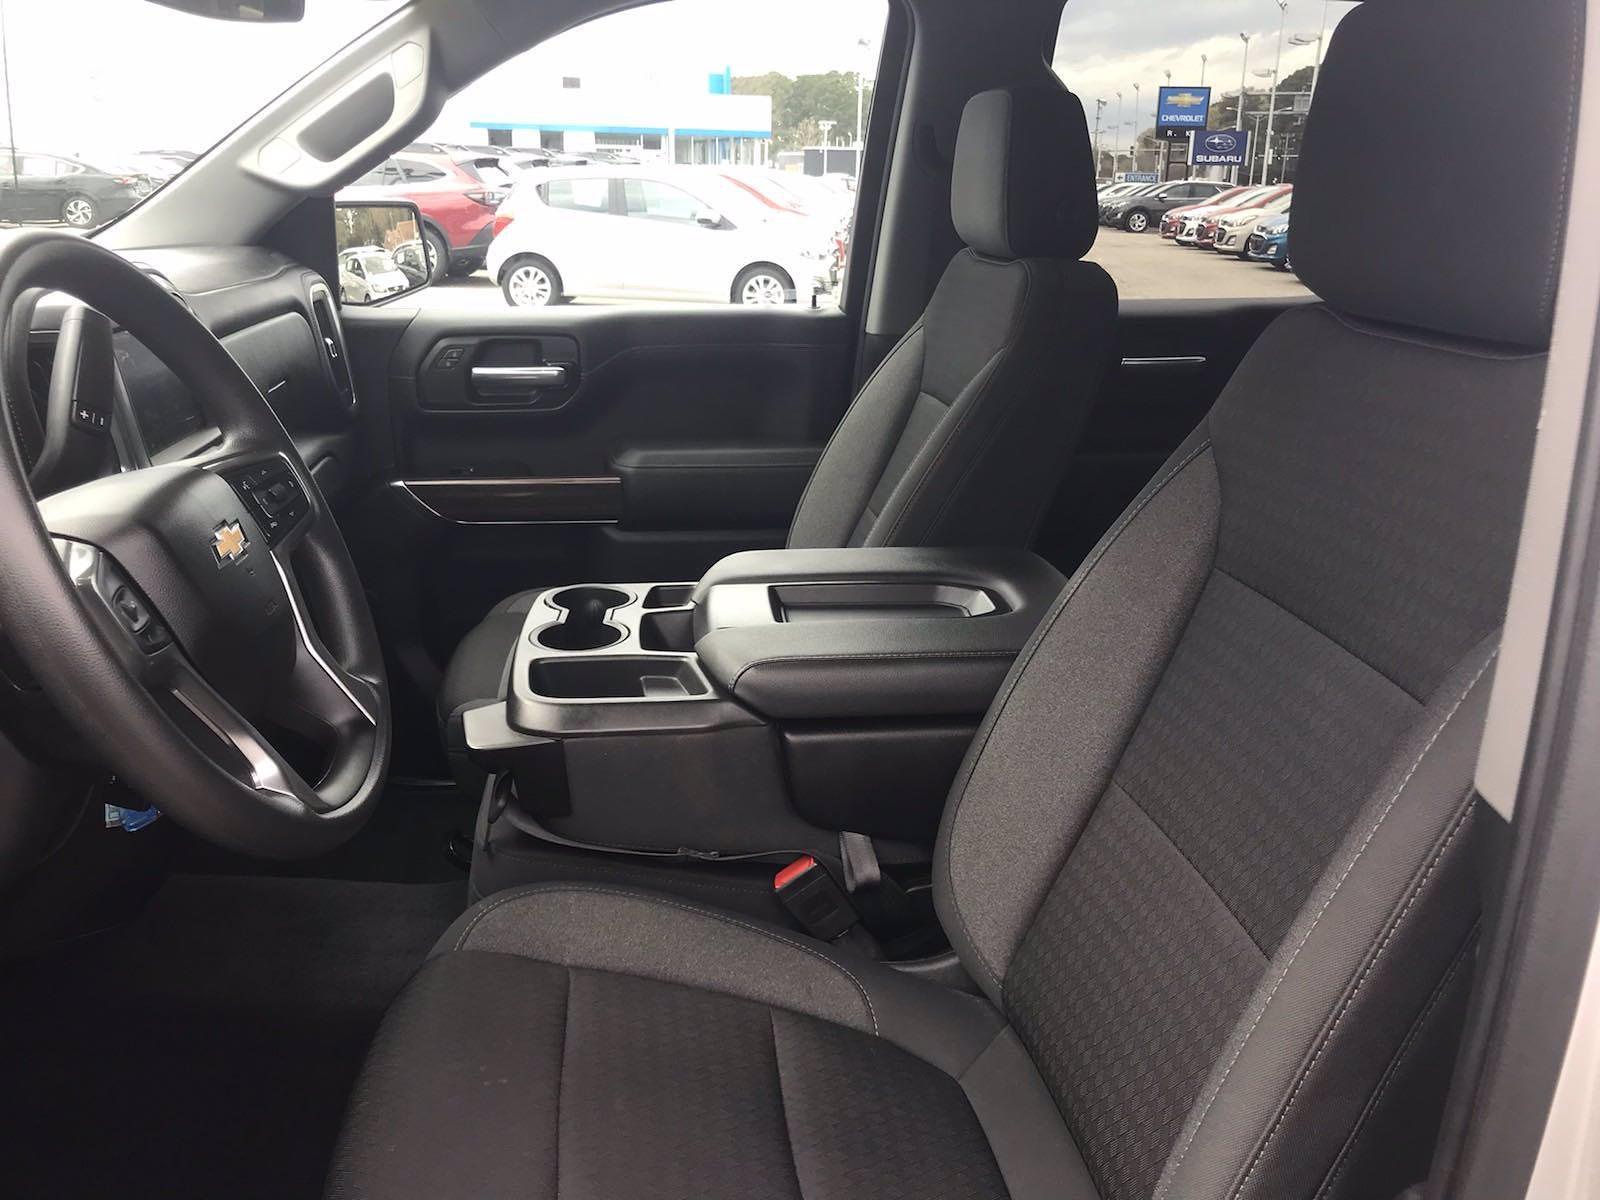 2020 Chevrolet Silverado 1500 Crew Cab 4x4, Pickup #16449PN - photo 24